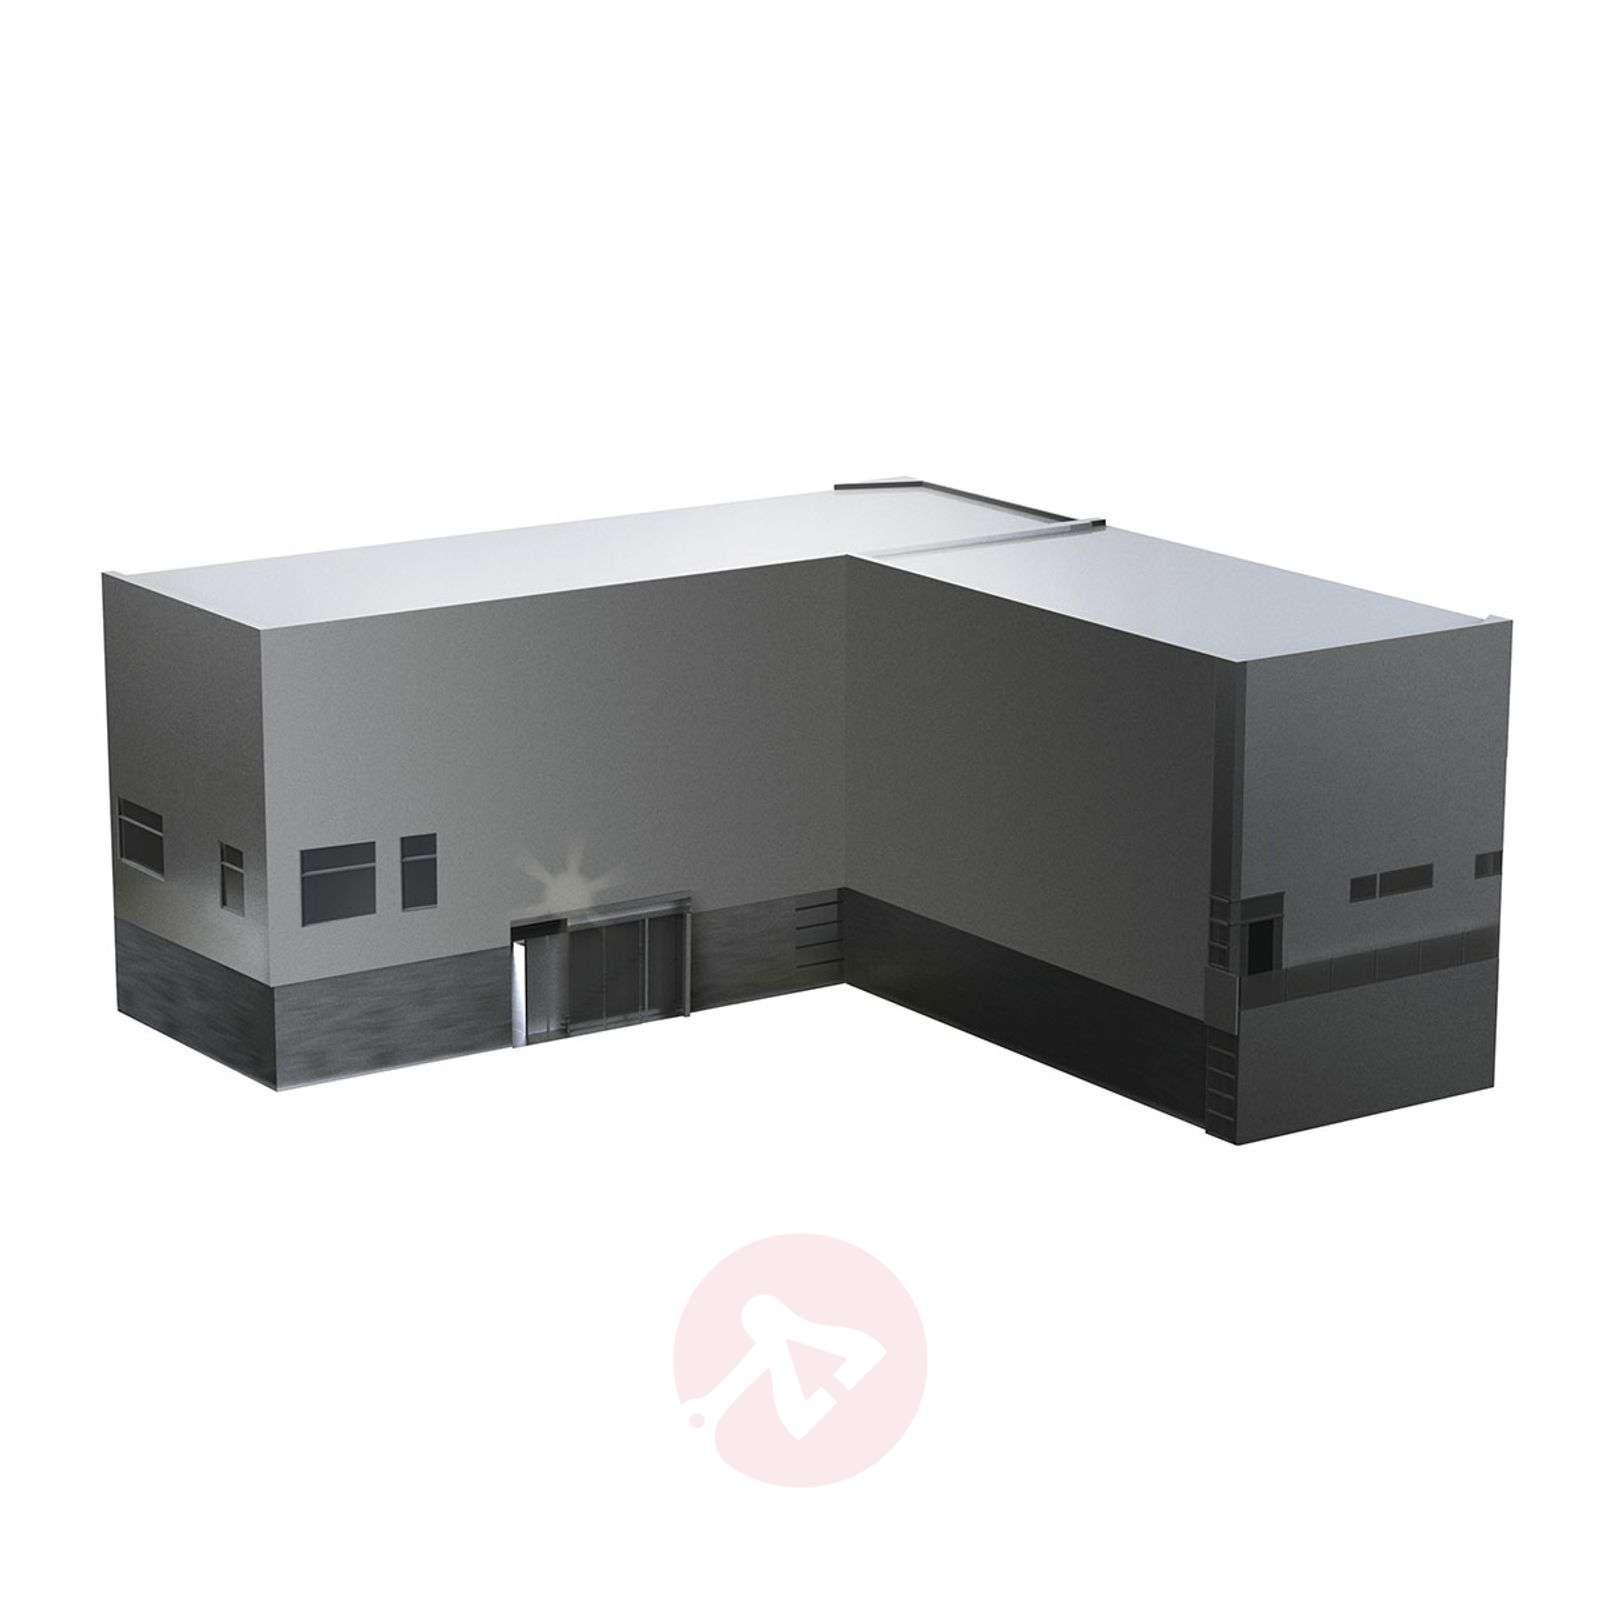 STEINEL XLED Pro Square SL kohdevalaisin ulos-8506067-01